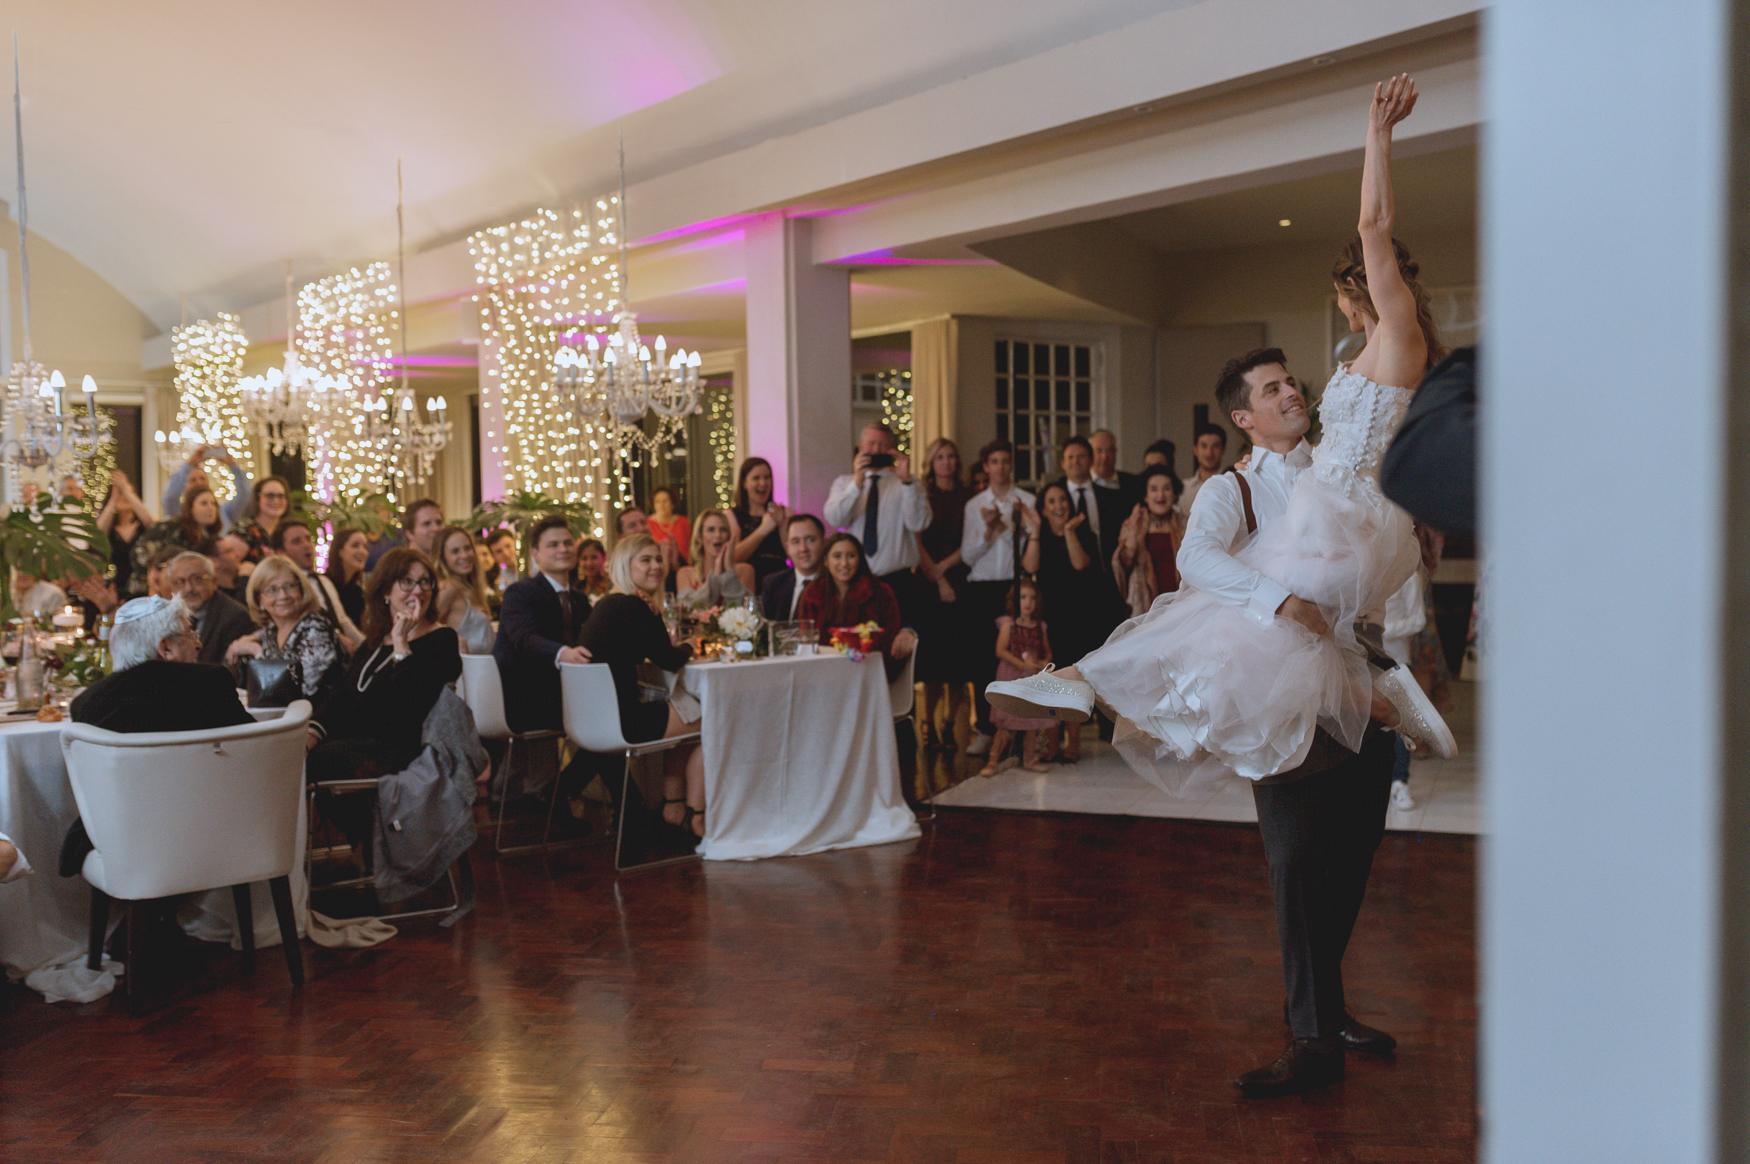 Leon_&_Martine's_Wedding_Photographs_17th_April_2019_@johnhenryweddingphoto_Low_Resolution_Web-555.JPG